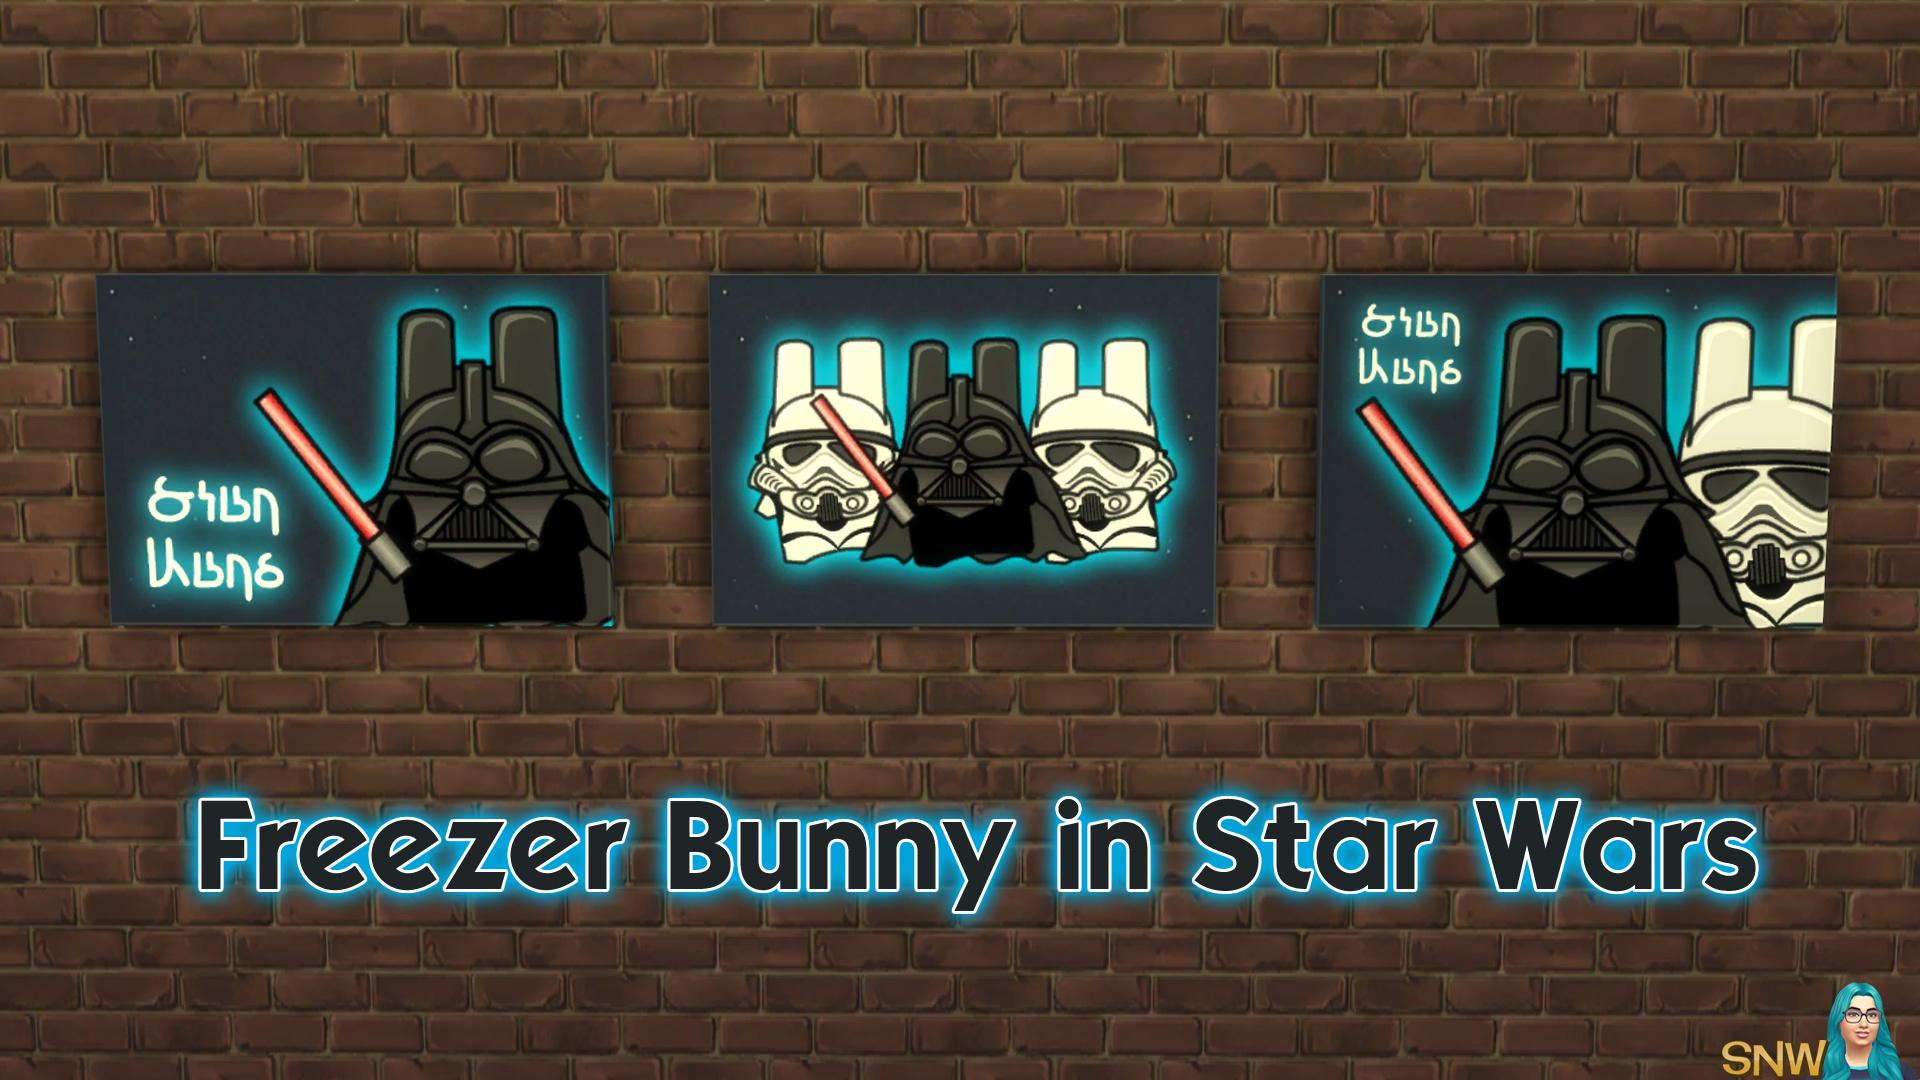 Freezer Bunny Star Wars paintings